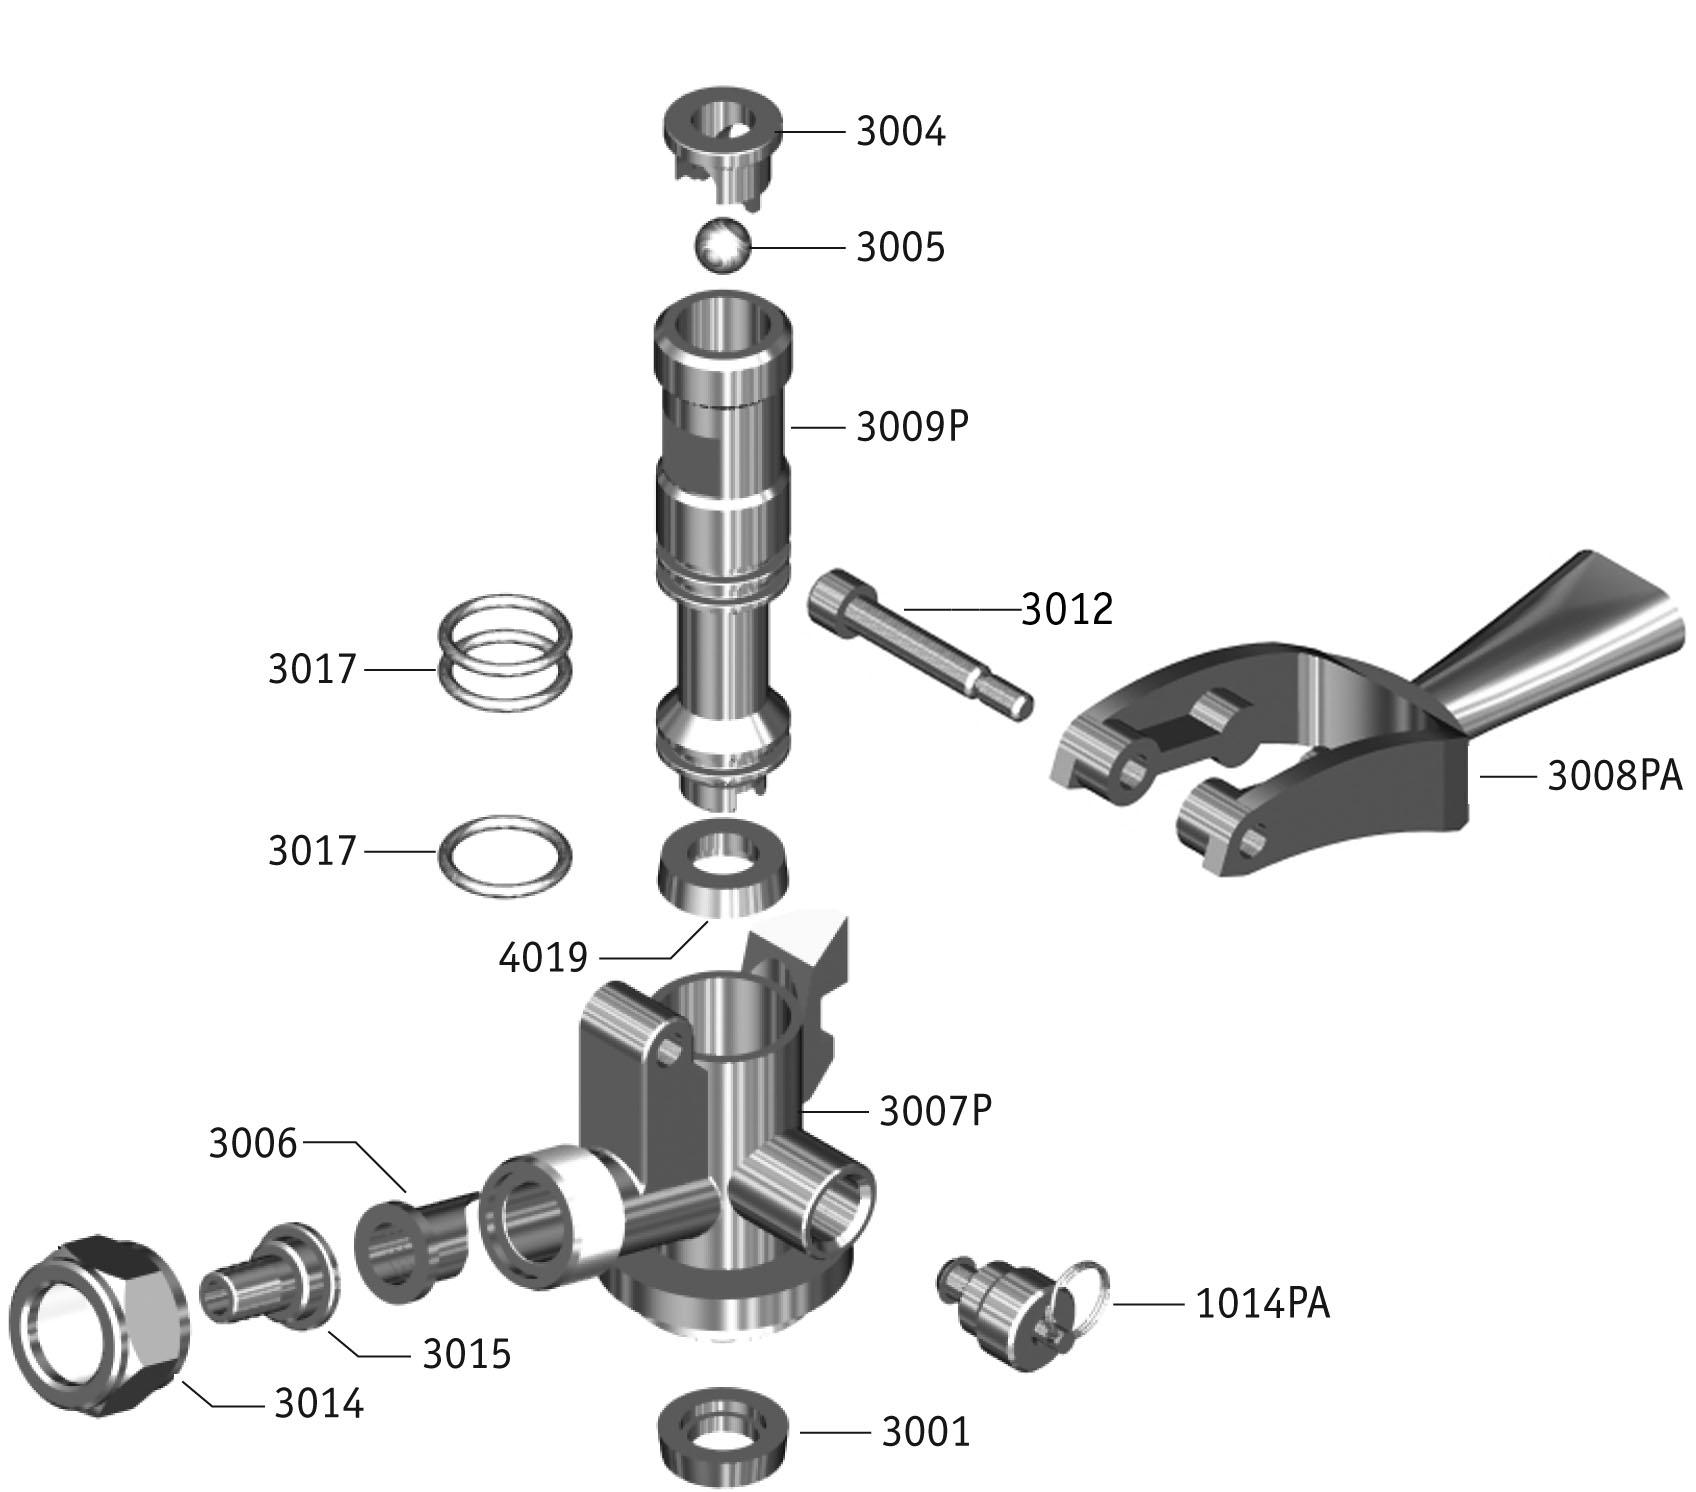 dtc300-diag.jpg